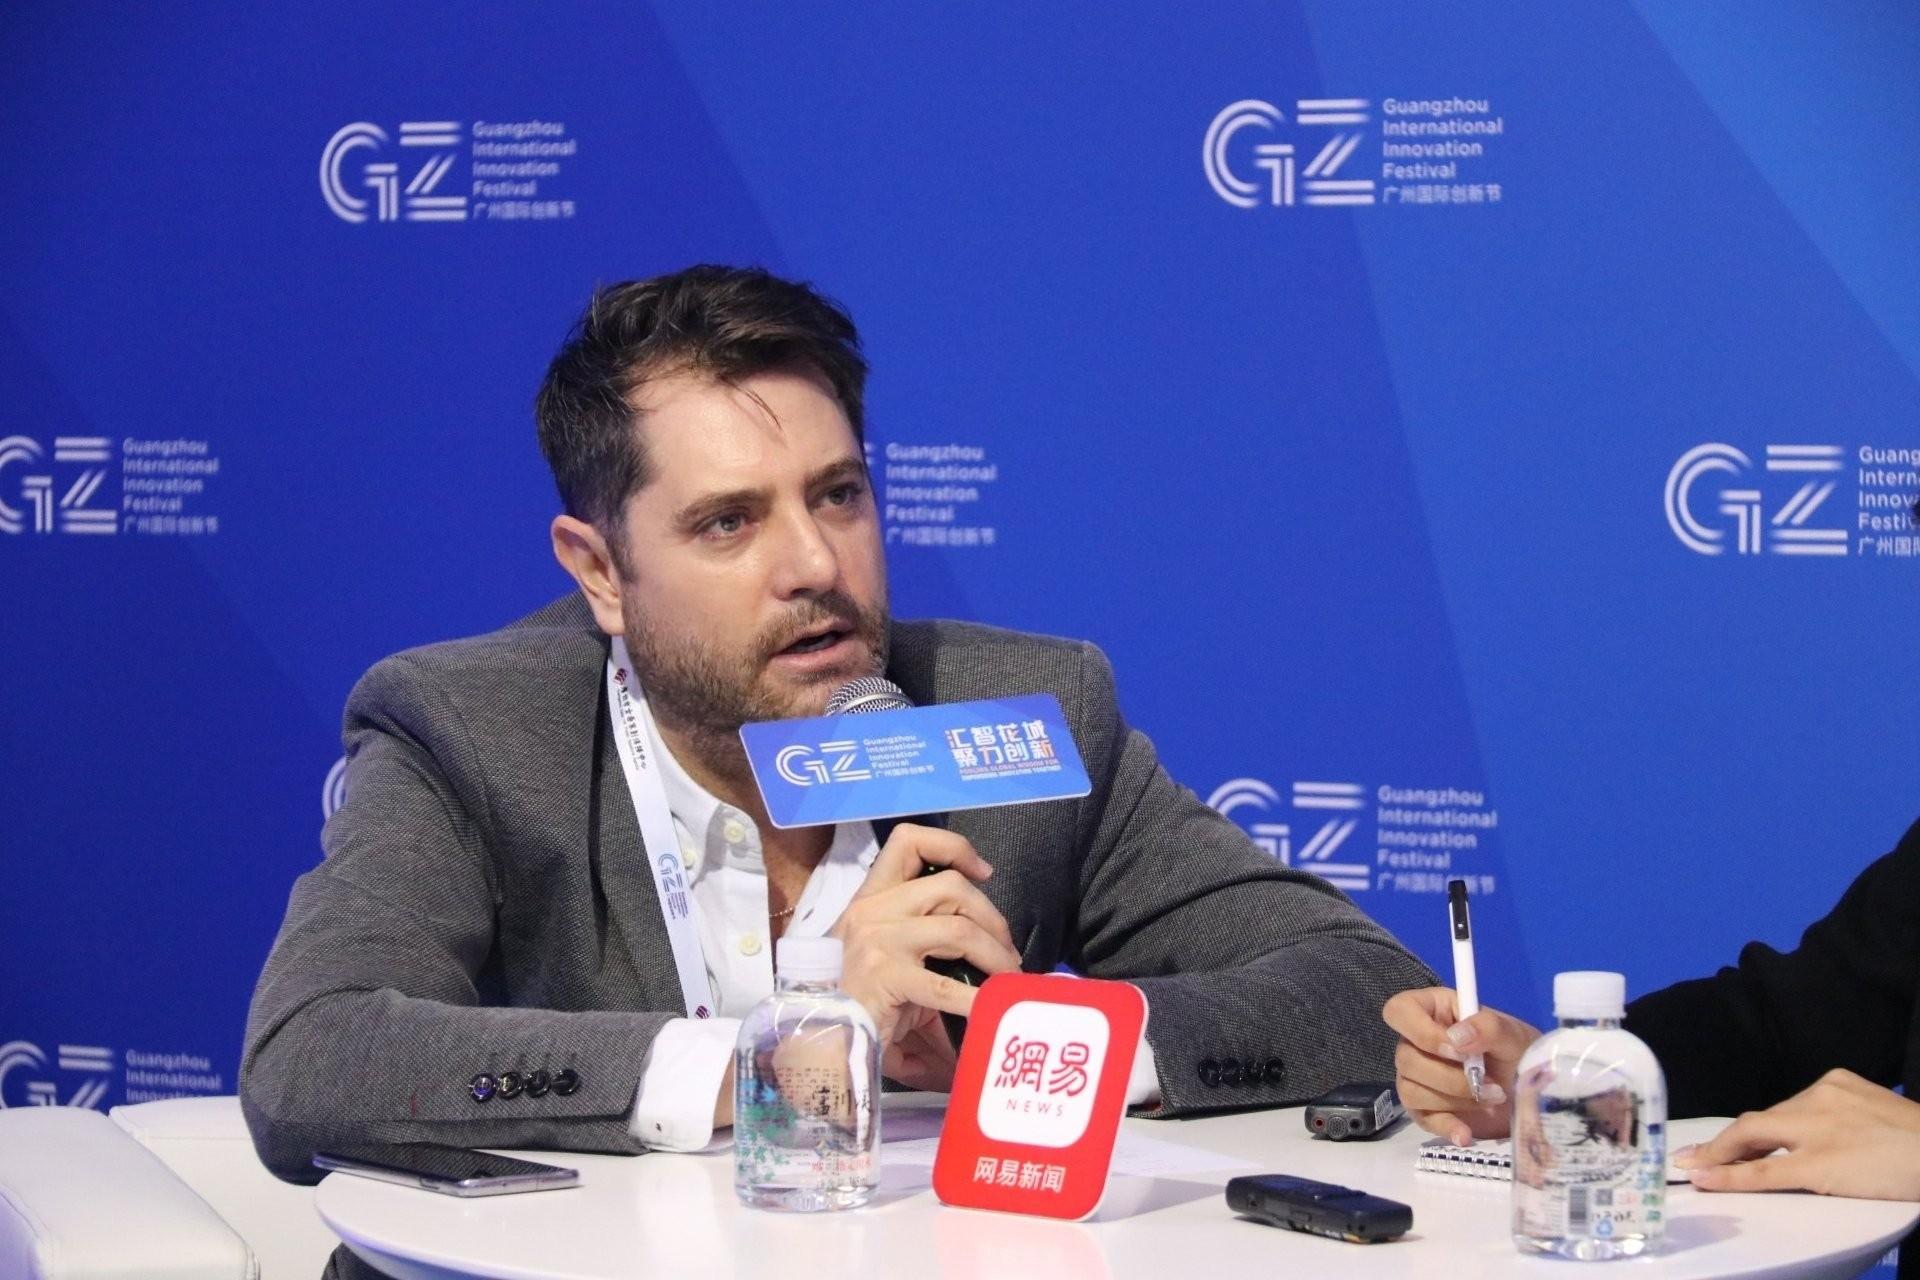 Peleg Lewi, cónsul general de Israel en Guangzhou